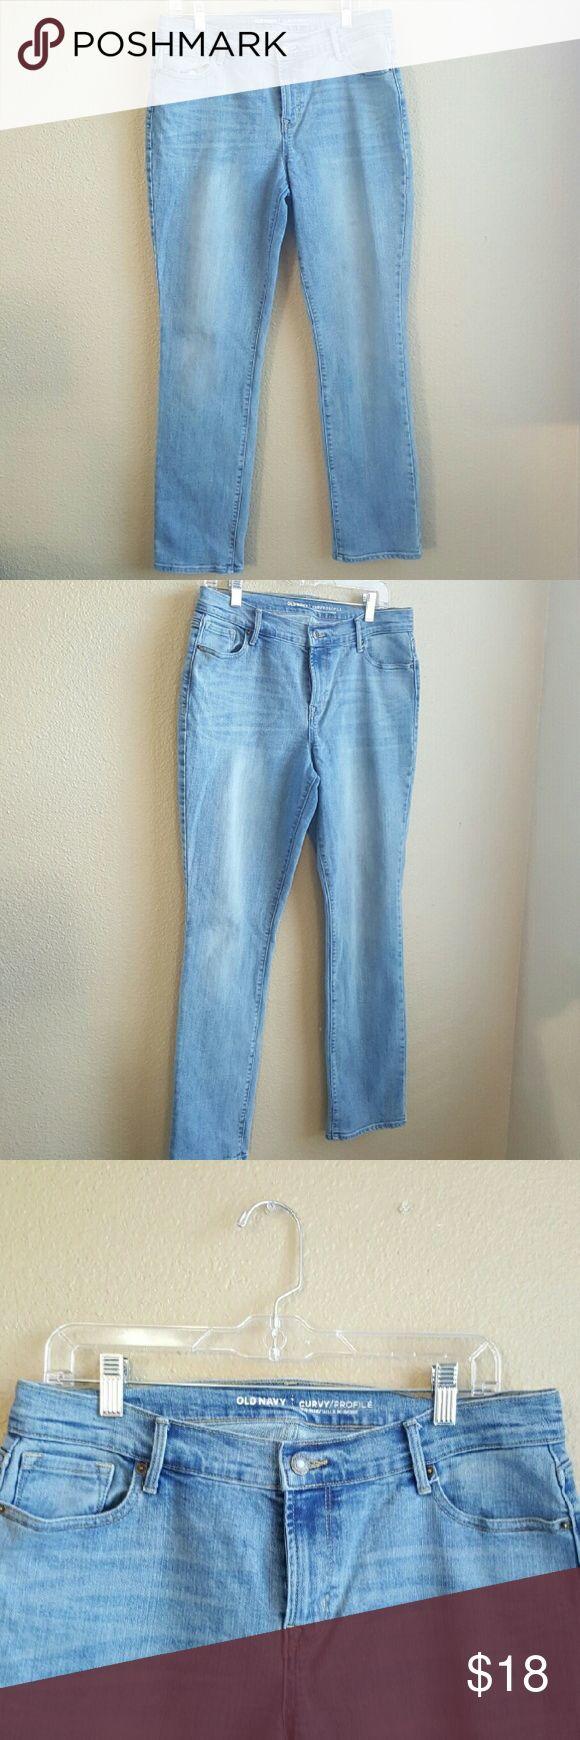 Selling this Old Navy Curvy Jeans on Poshmark! My username is: kikki_smee. #shopmycloset #poshmark #fashion #shopping #style #forsale #Old Navy #Denim